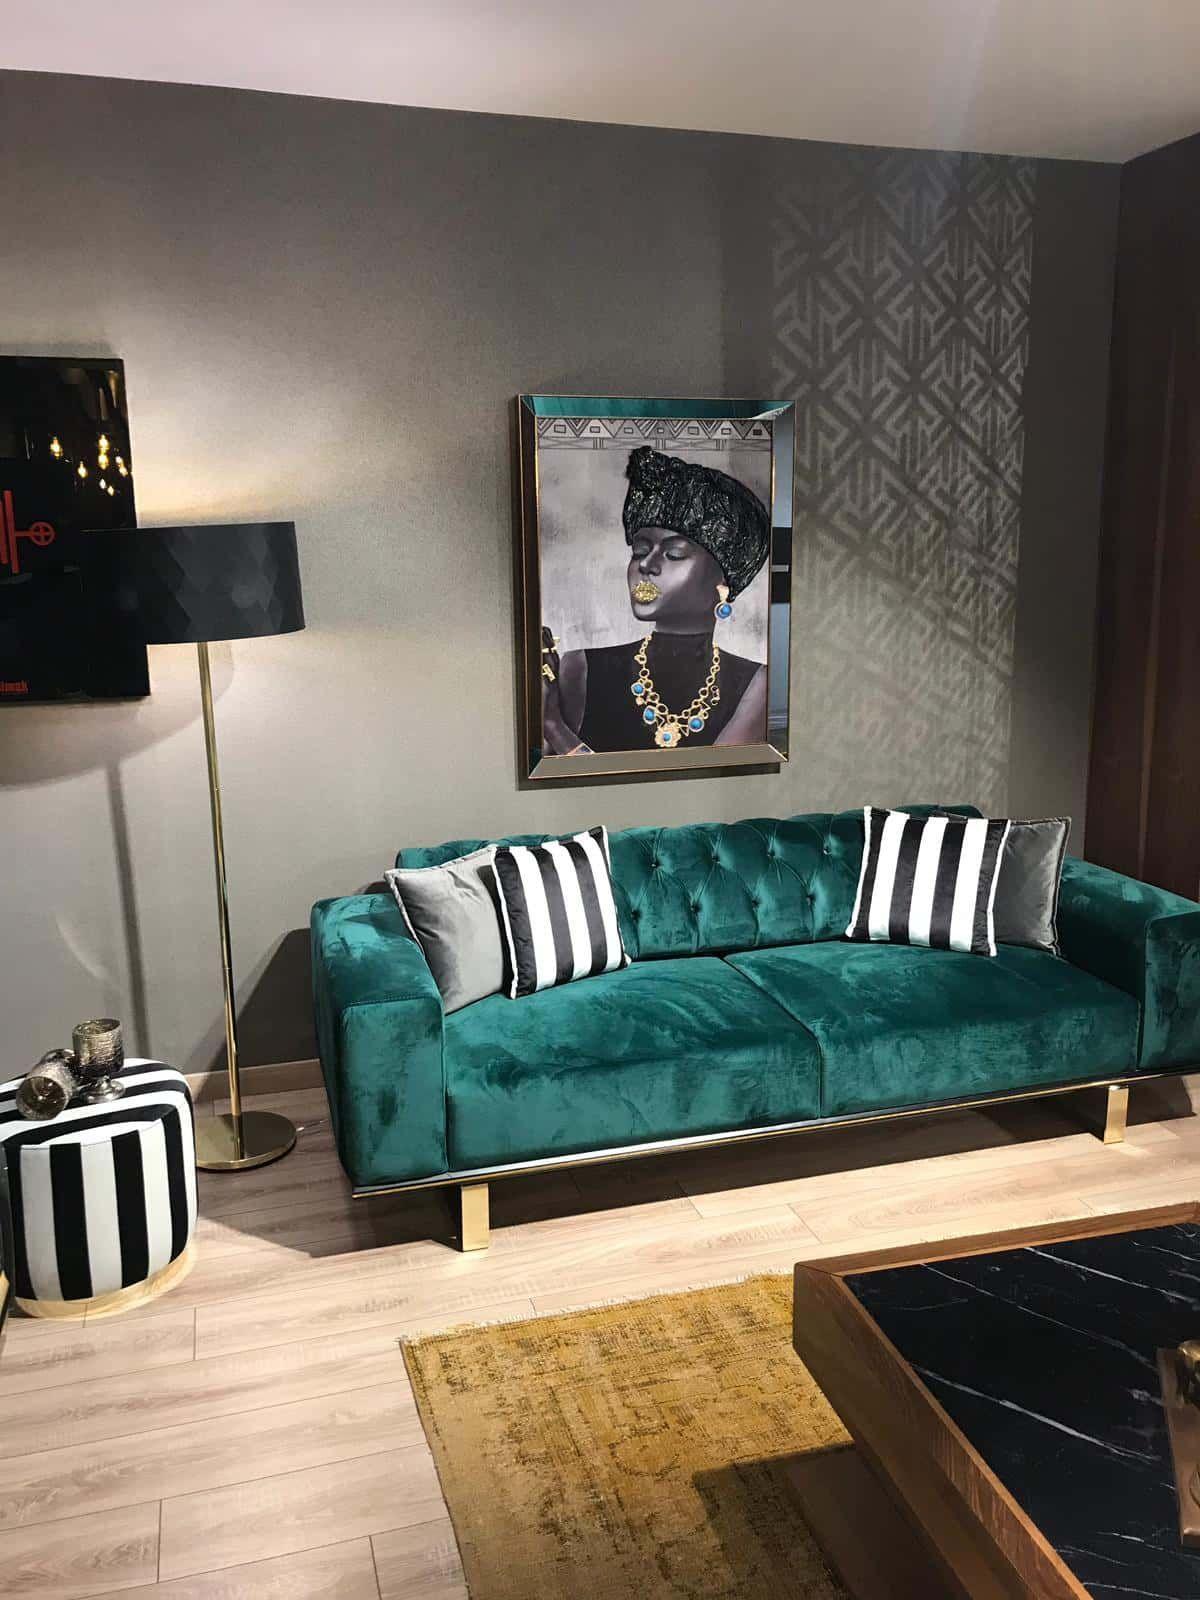 10 Belhi Koltuk Takimi Oturma Odalari Tanriverdi Mobilya Japanesehomedesign Belhi Koltuk Takimi Oturma Oda In 2020 Sofa Set Home Office Design Living Room Decor